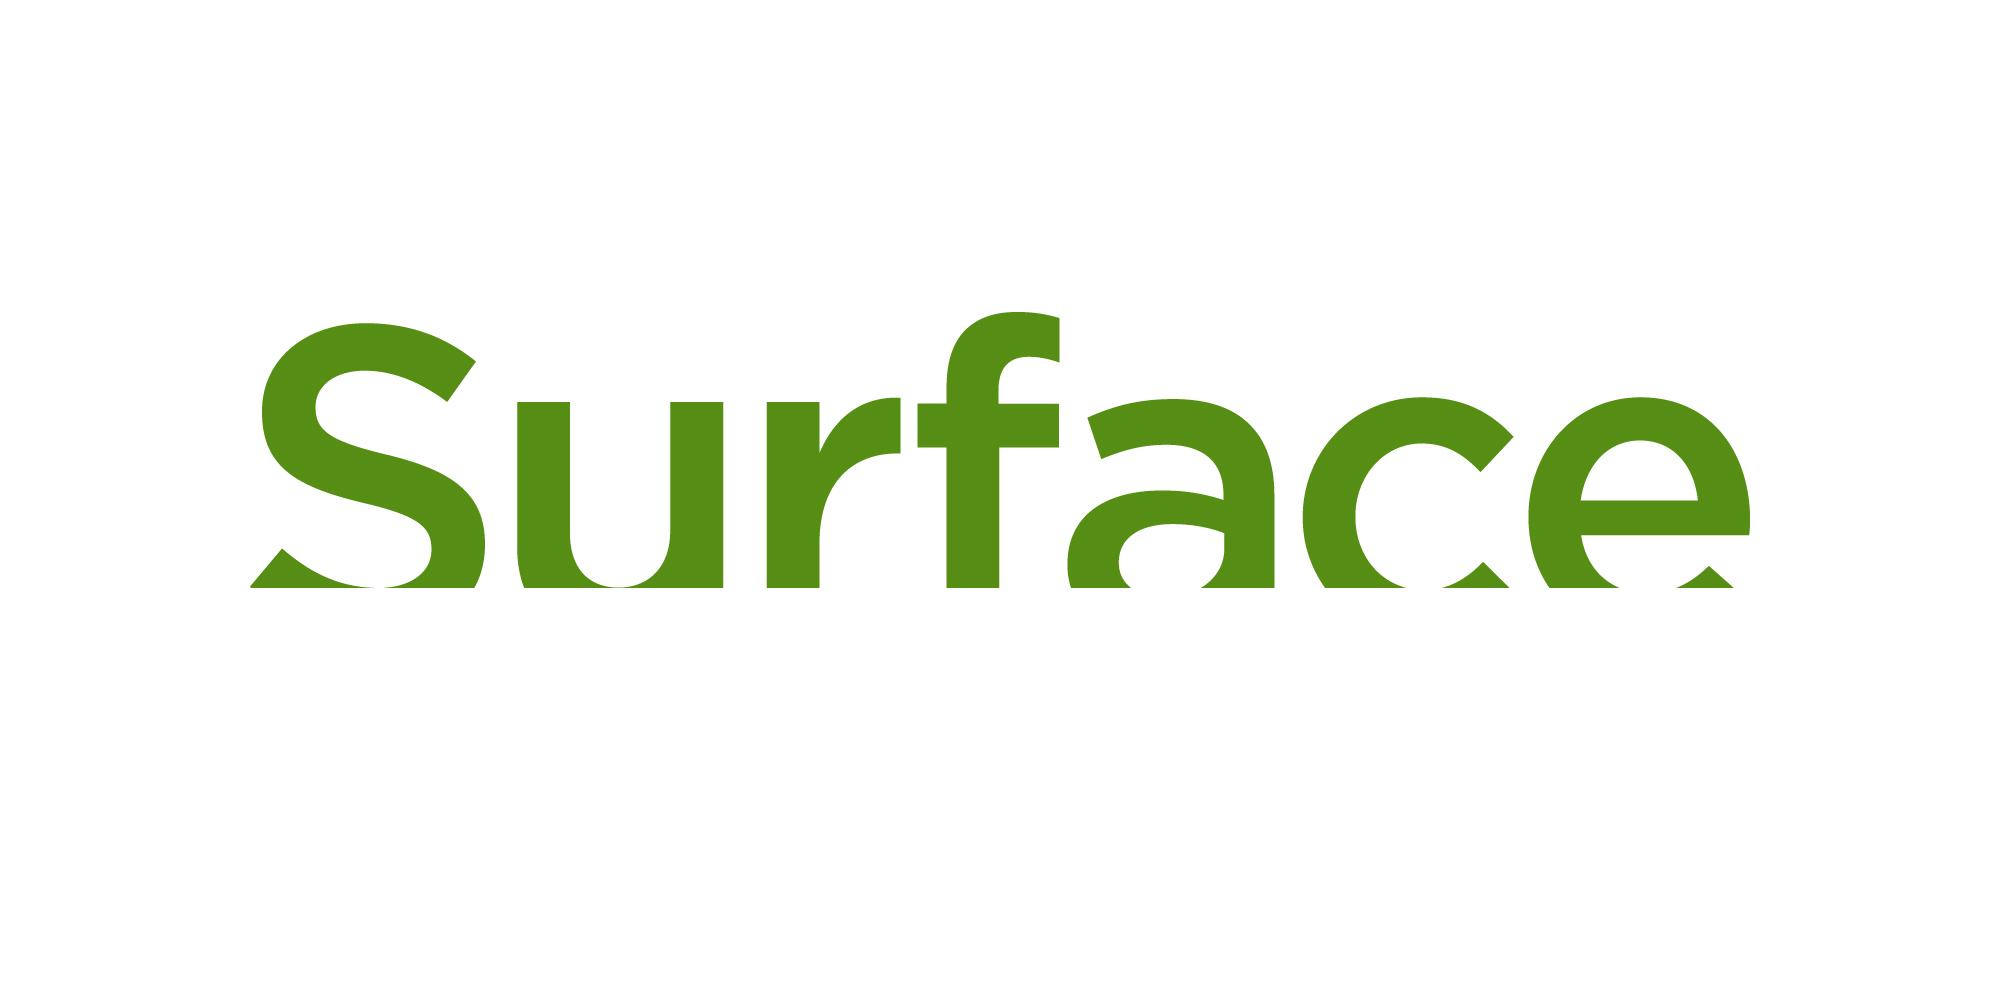 Surface 678 Logo